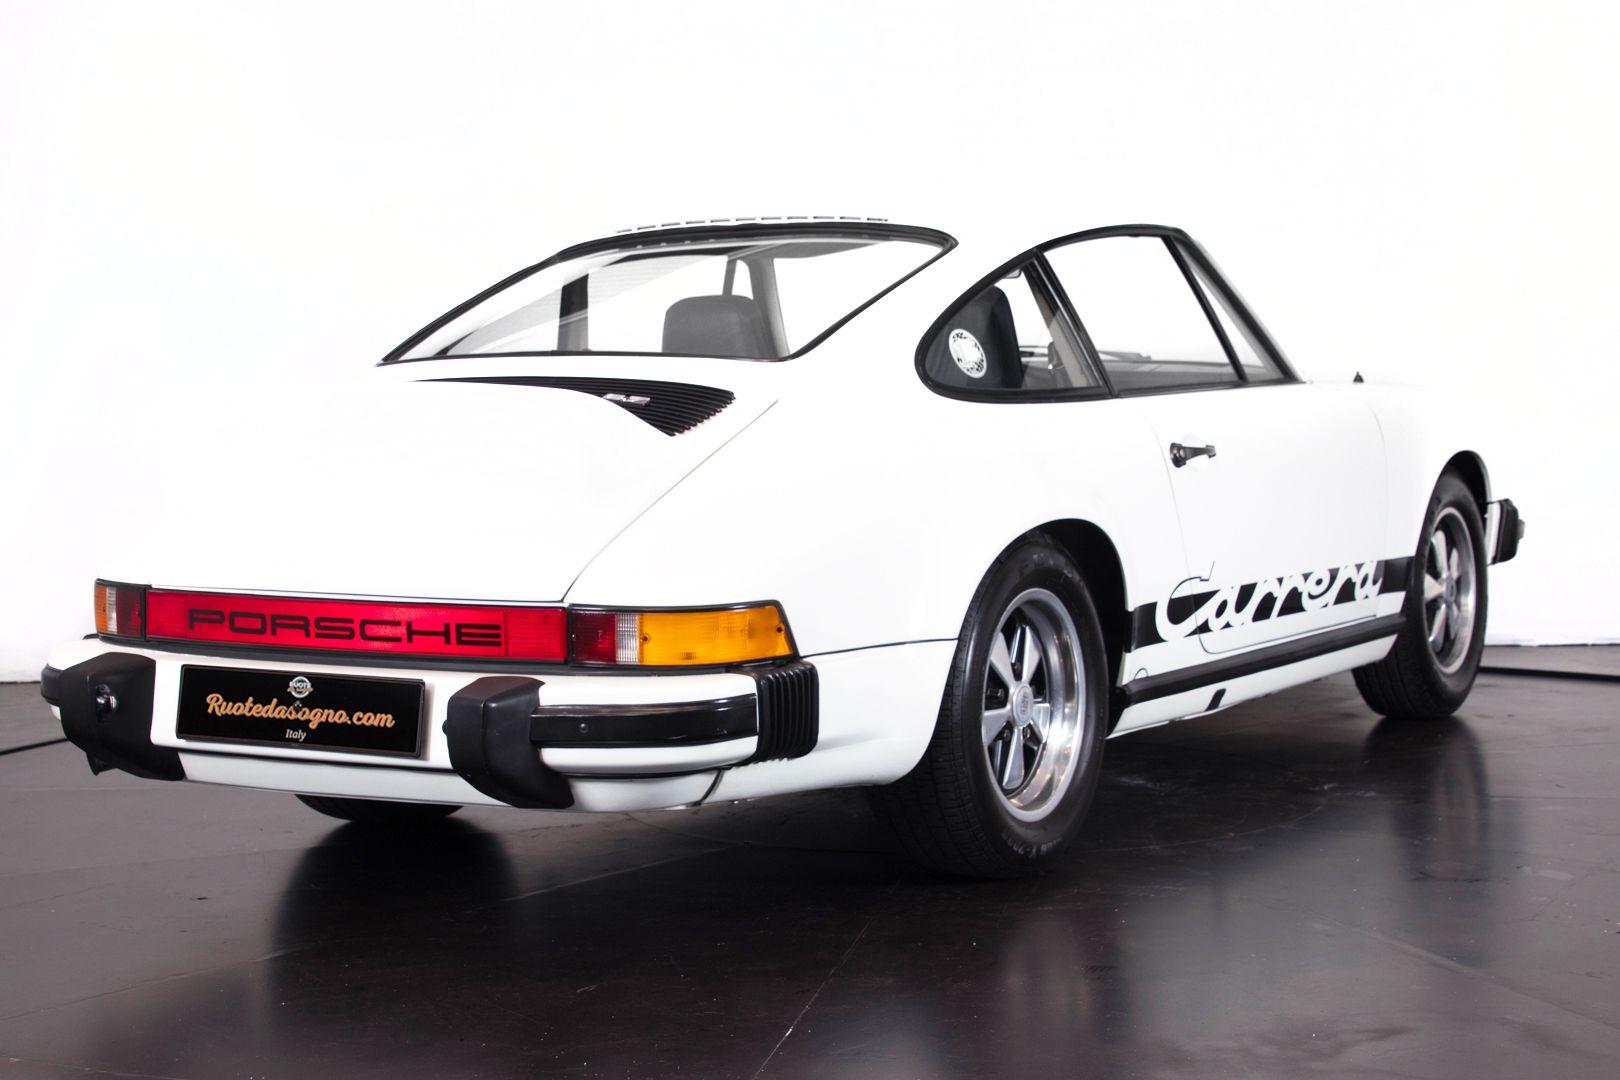 1973 Porsche 911 Carrera 2.7 26475